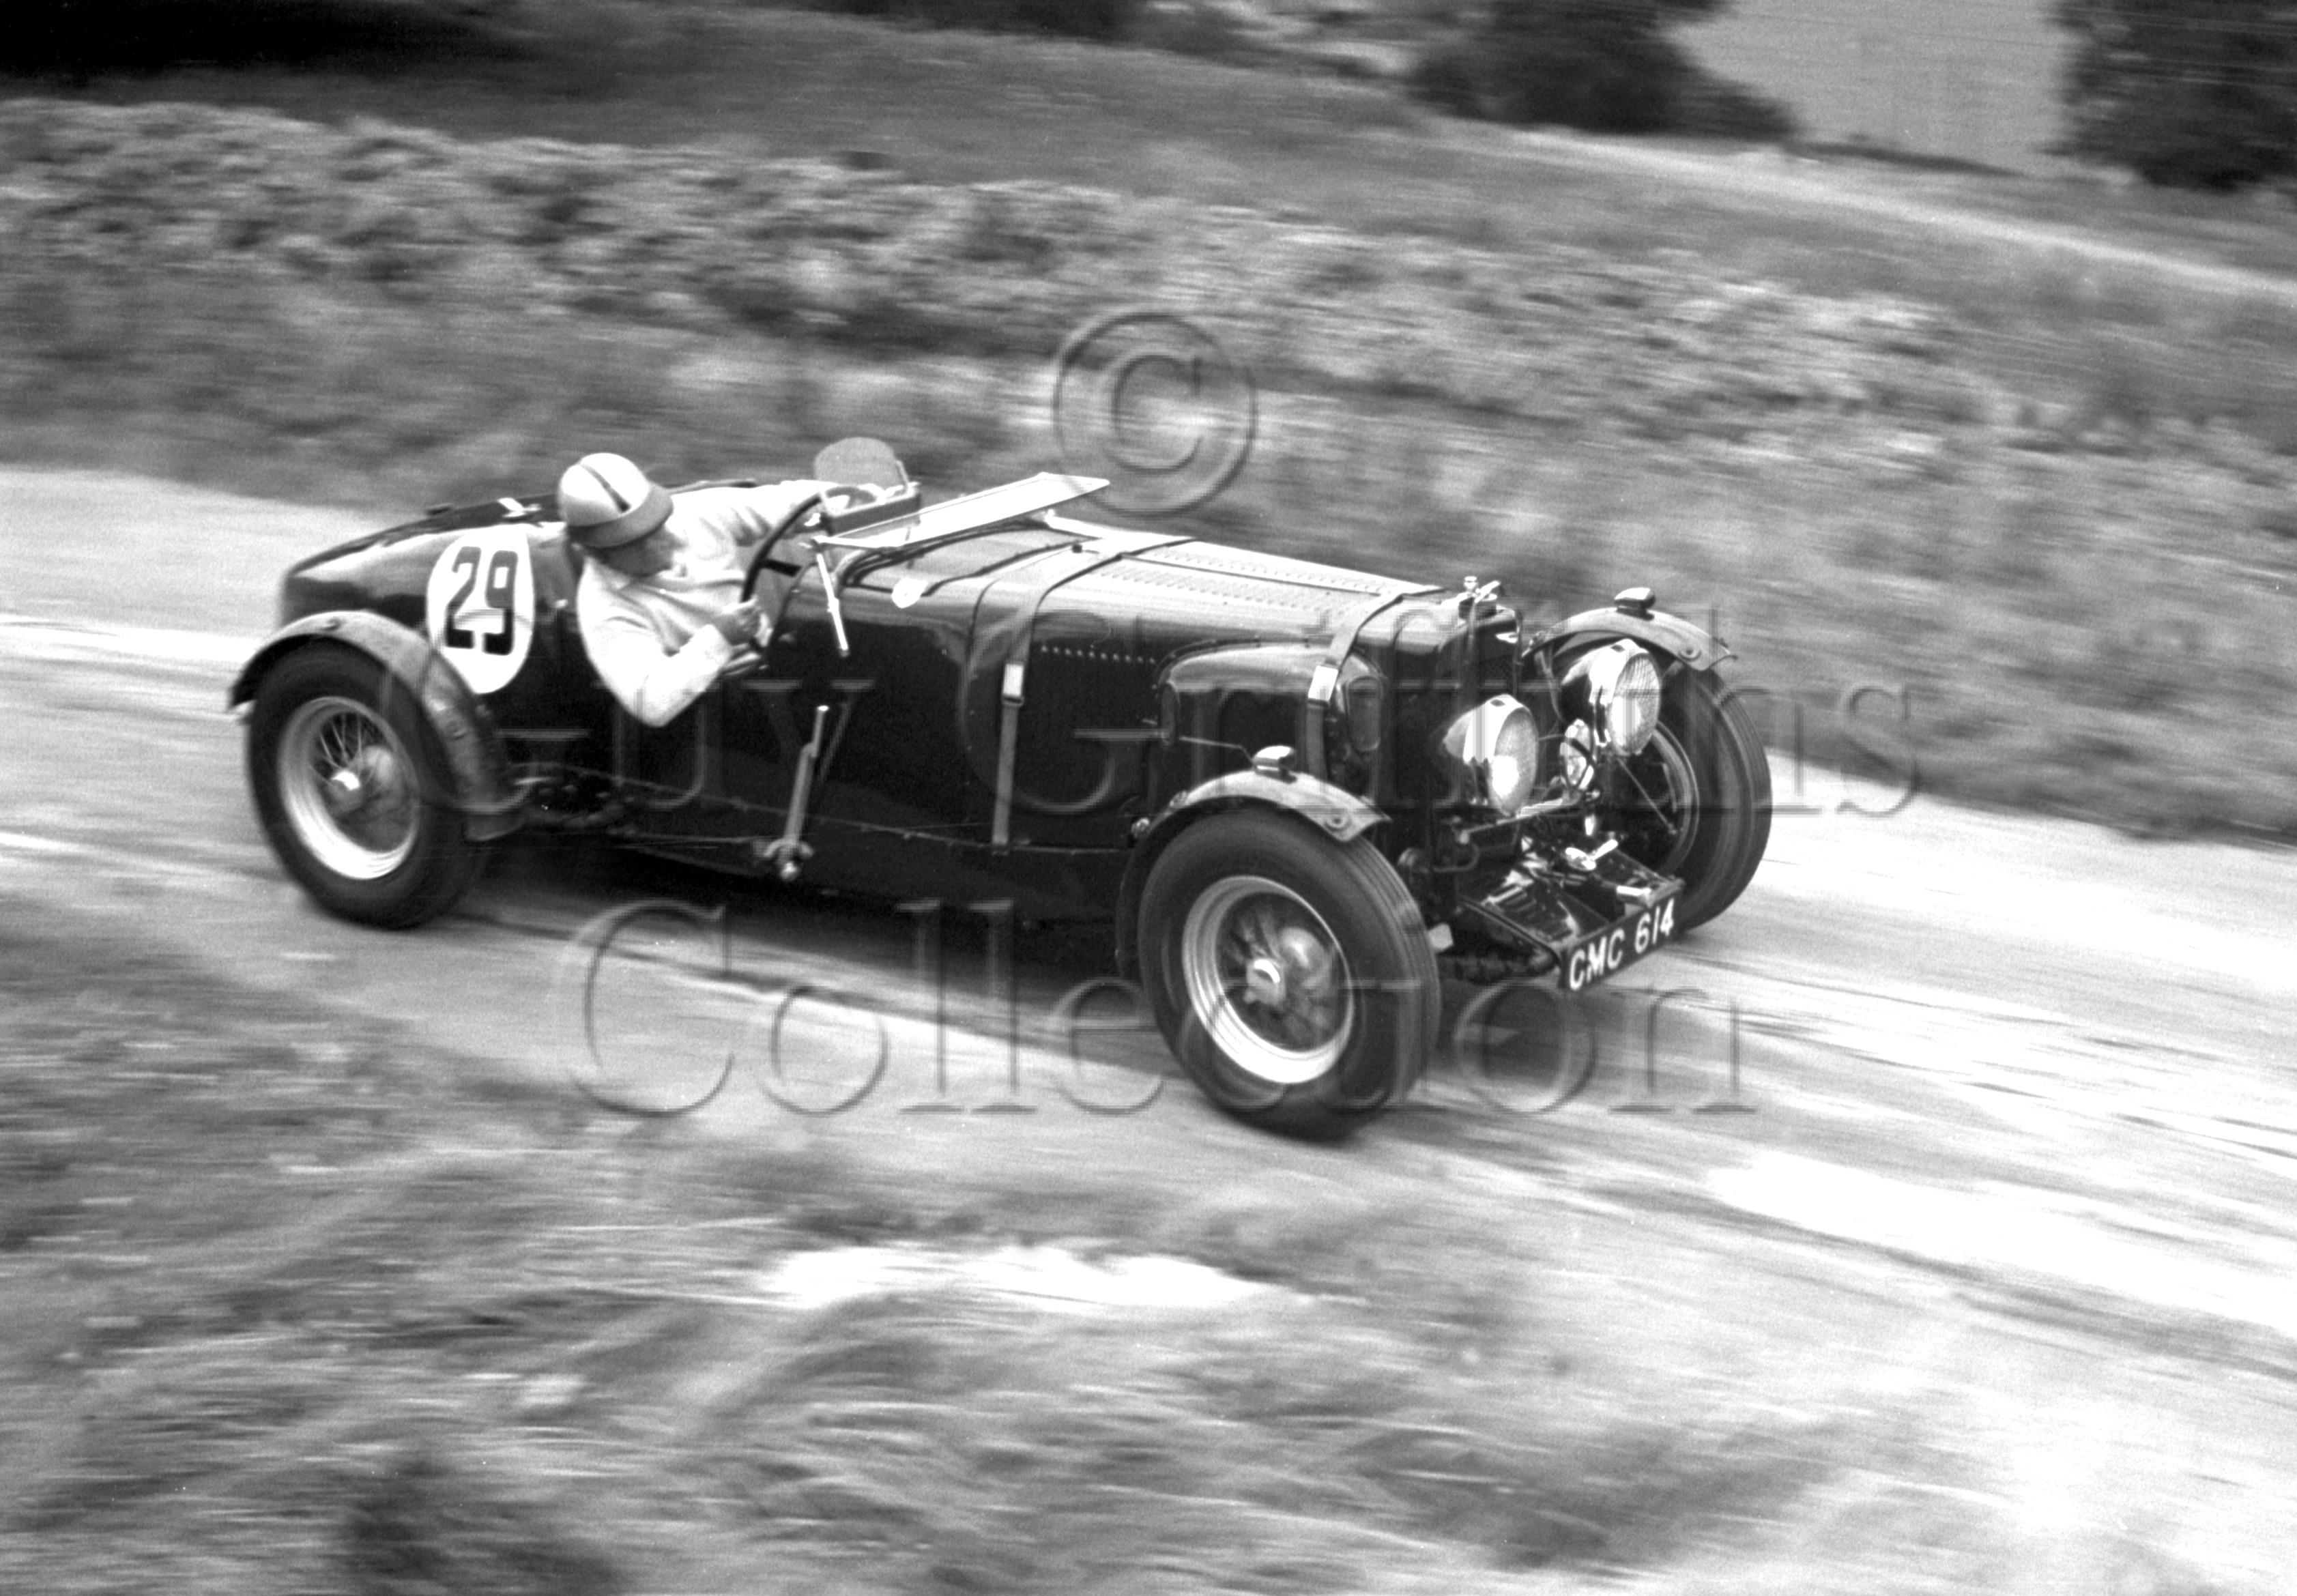 77-552—-Aston-Martin-CMC-614–Prescott–18-08-1963.jpg - Guy Griffiths Collection